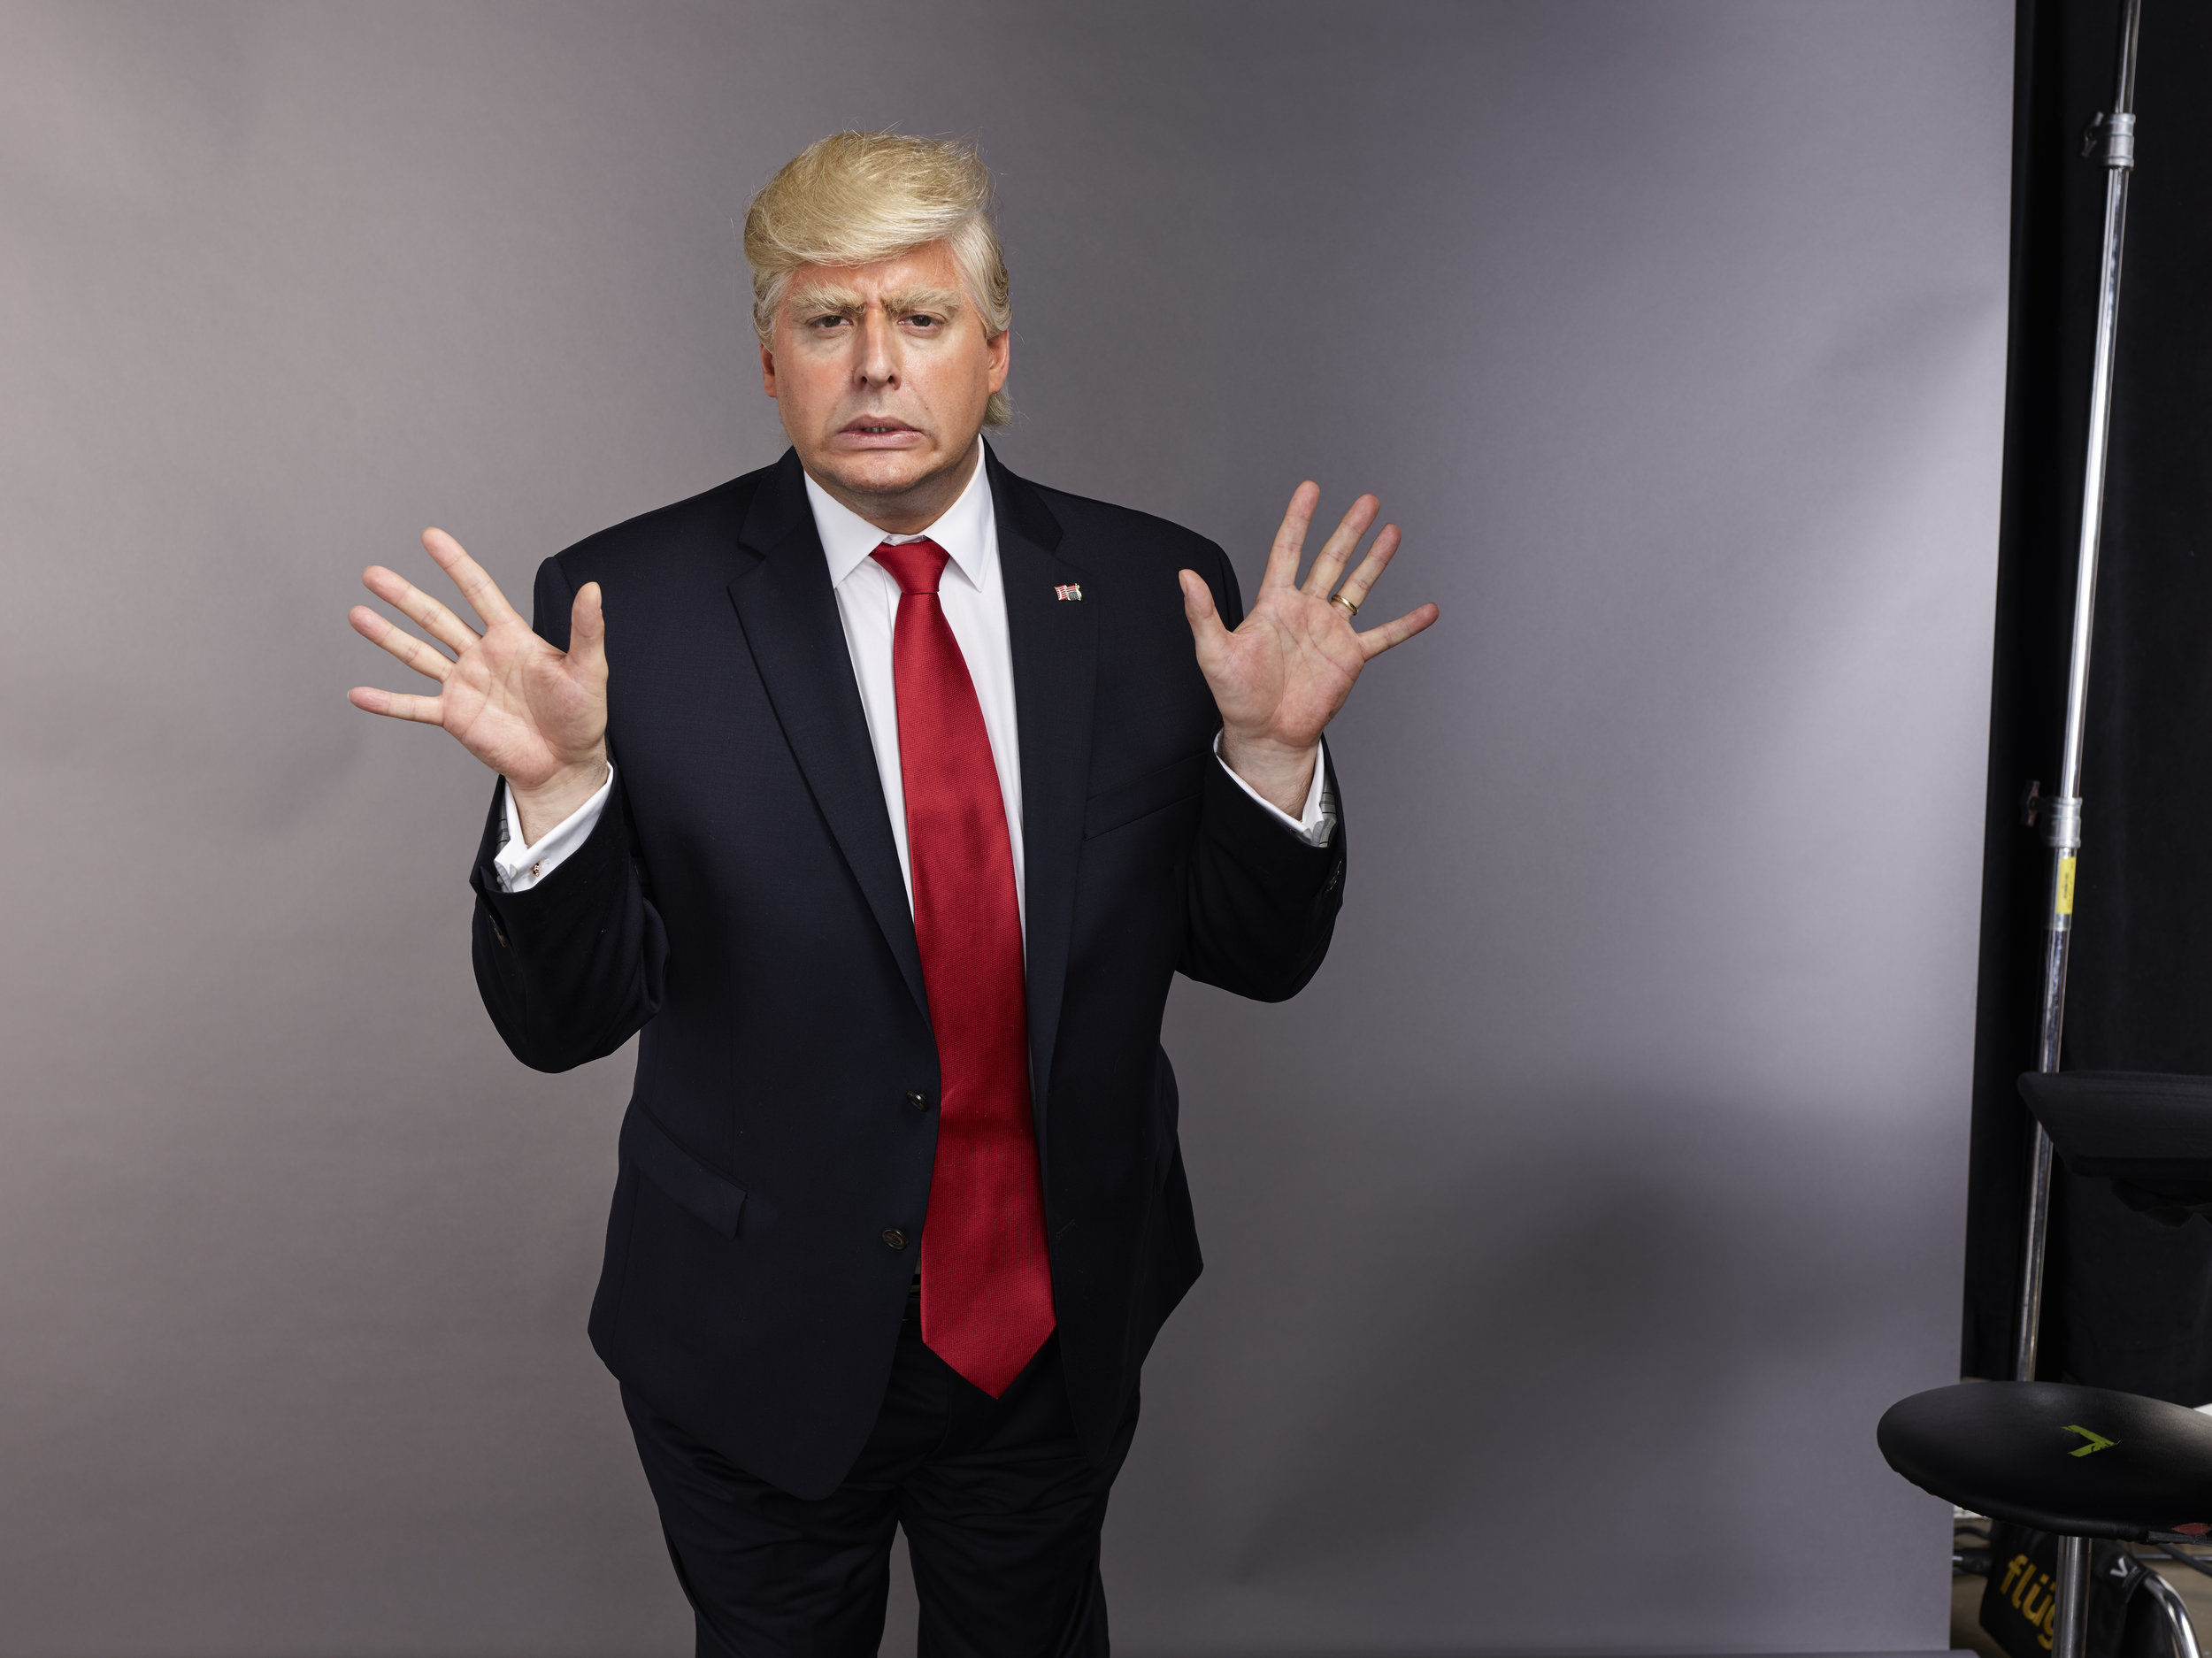 The-President-Show-S1-Seamless_0110.jpg